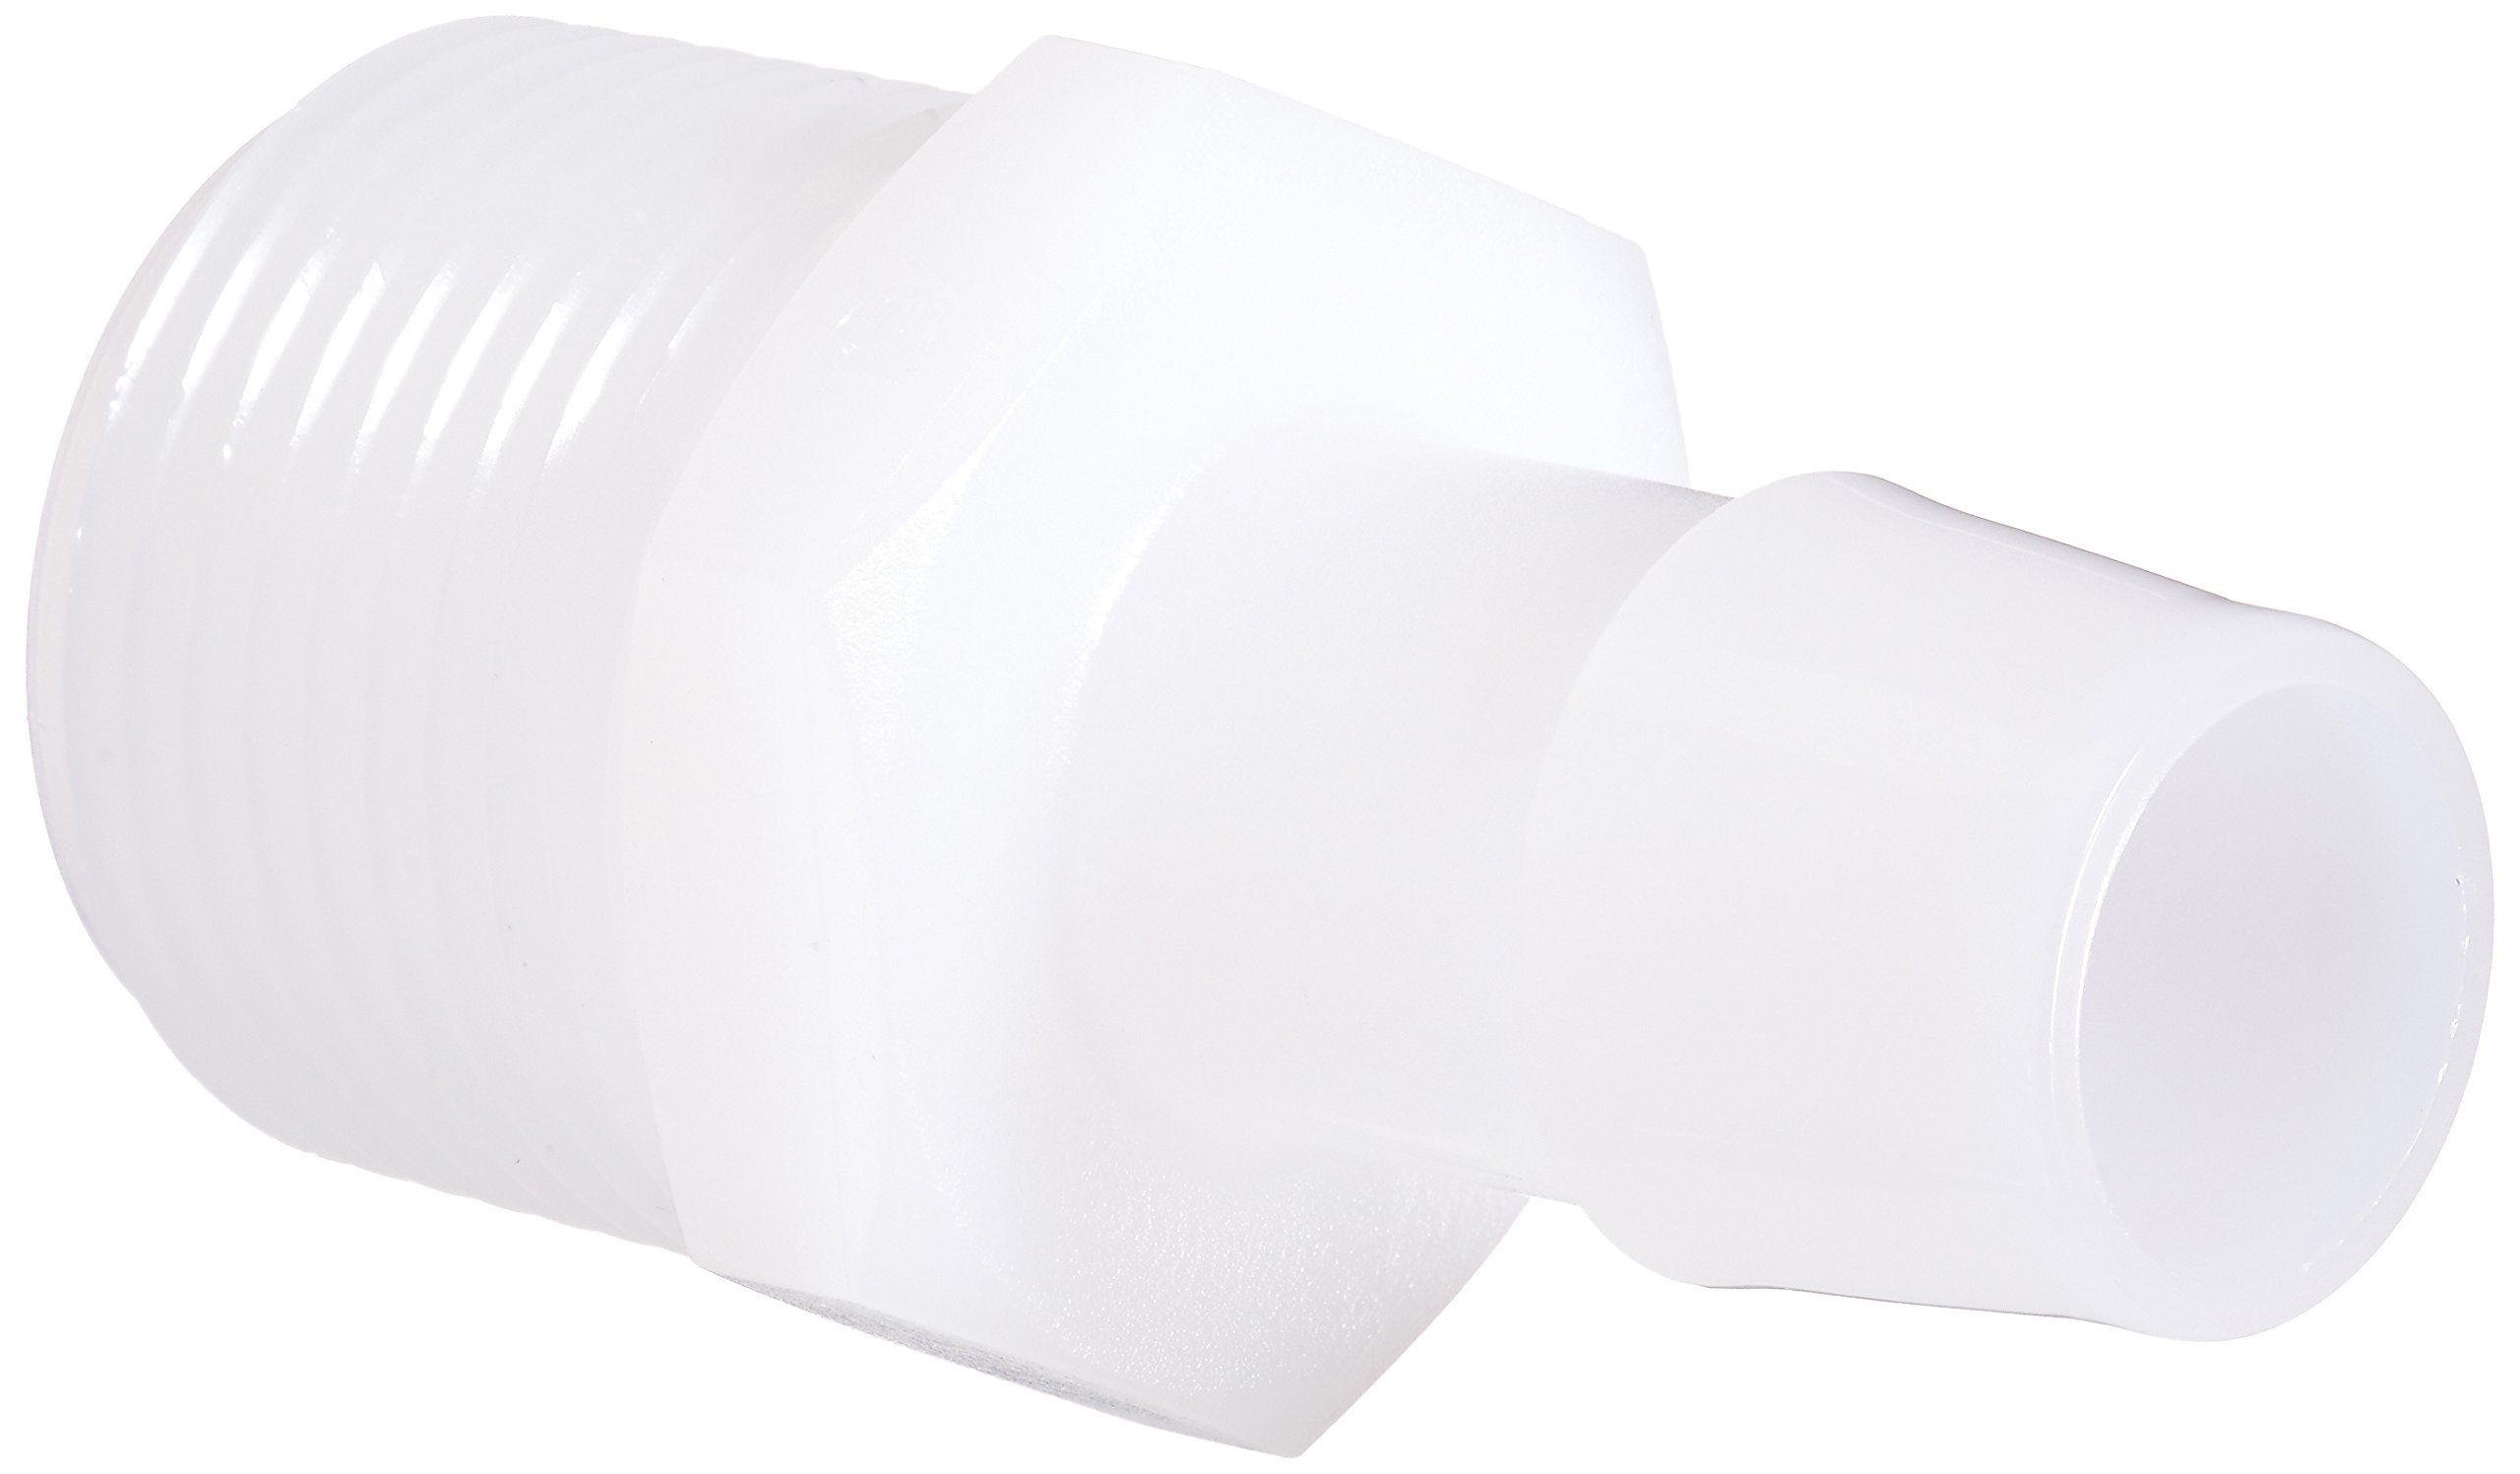 Eldon James A12-10HDPE High Density Polyethylene Adapter Fitting, 3/4-14 NPT to 5/8'' Hose Barb (Pack of 10) by Eldon James